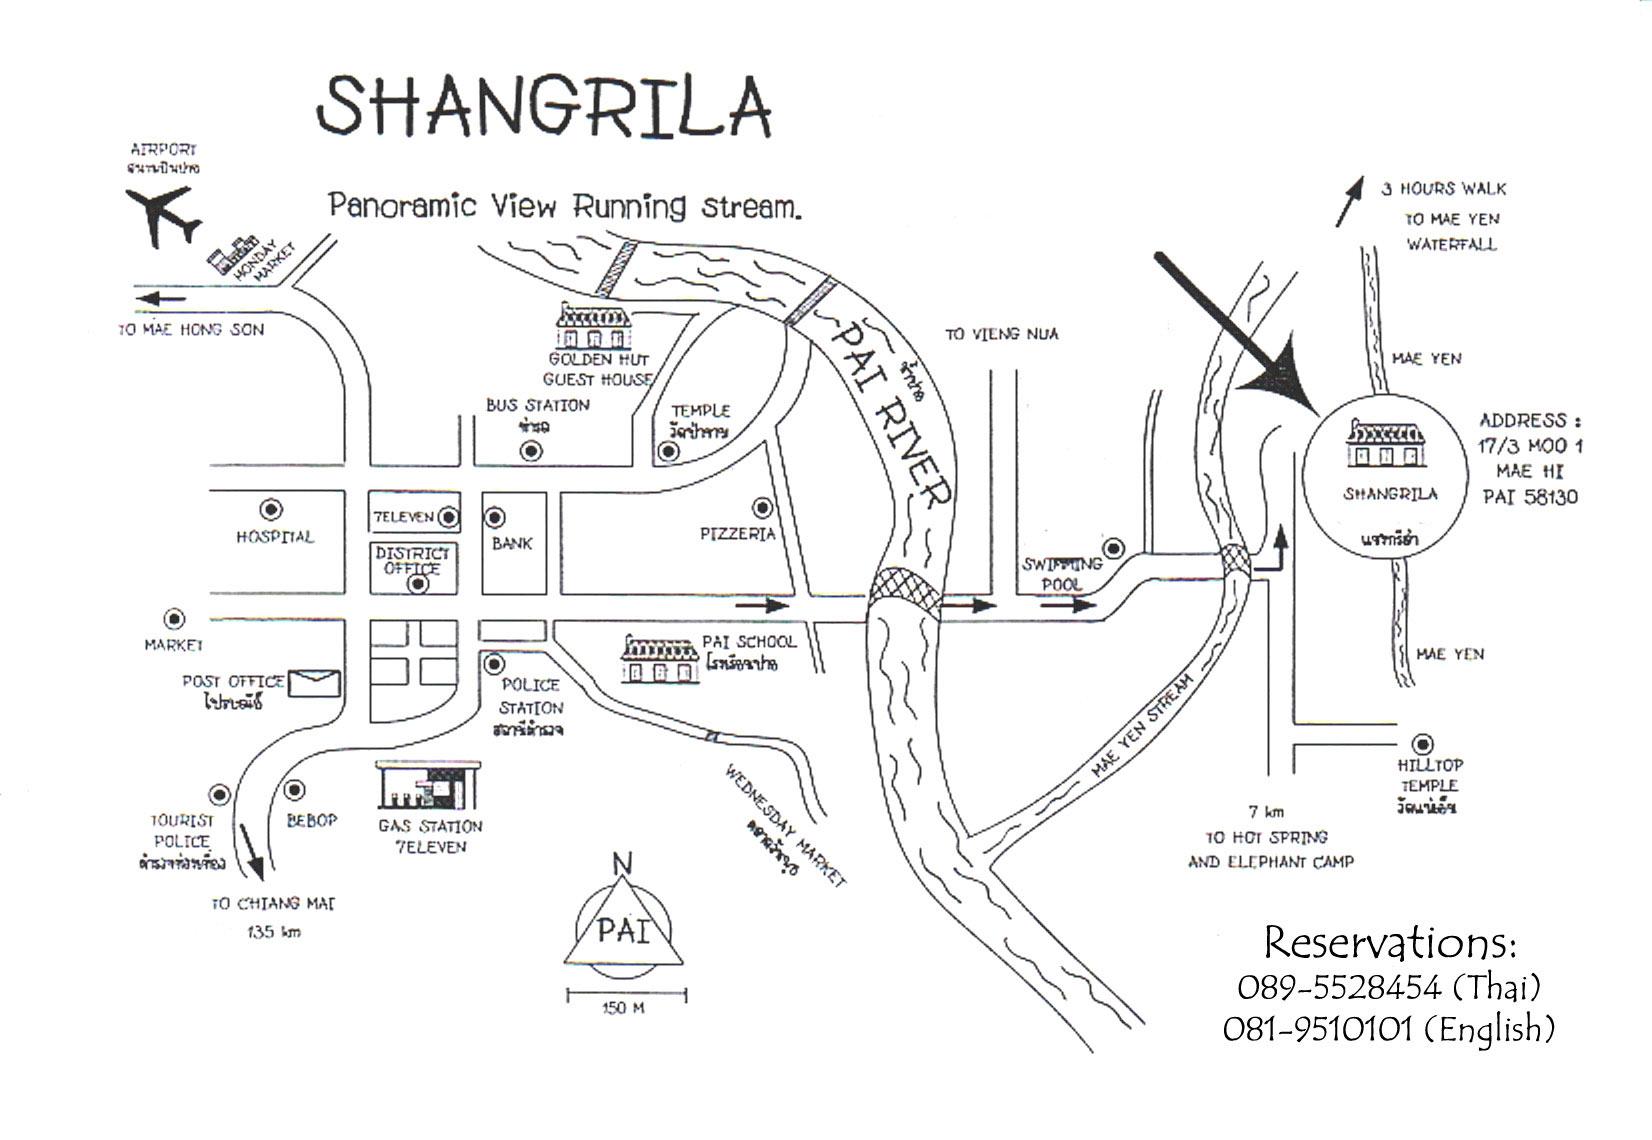 Map to the detox center at Shangrila resort